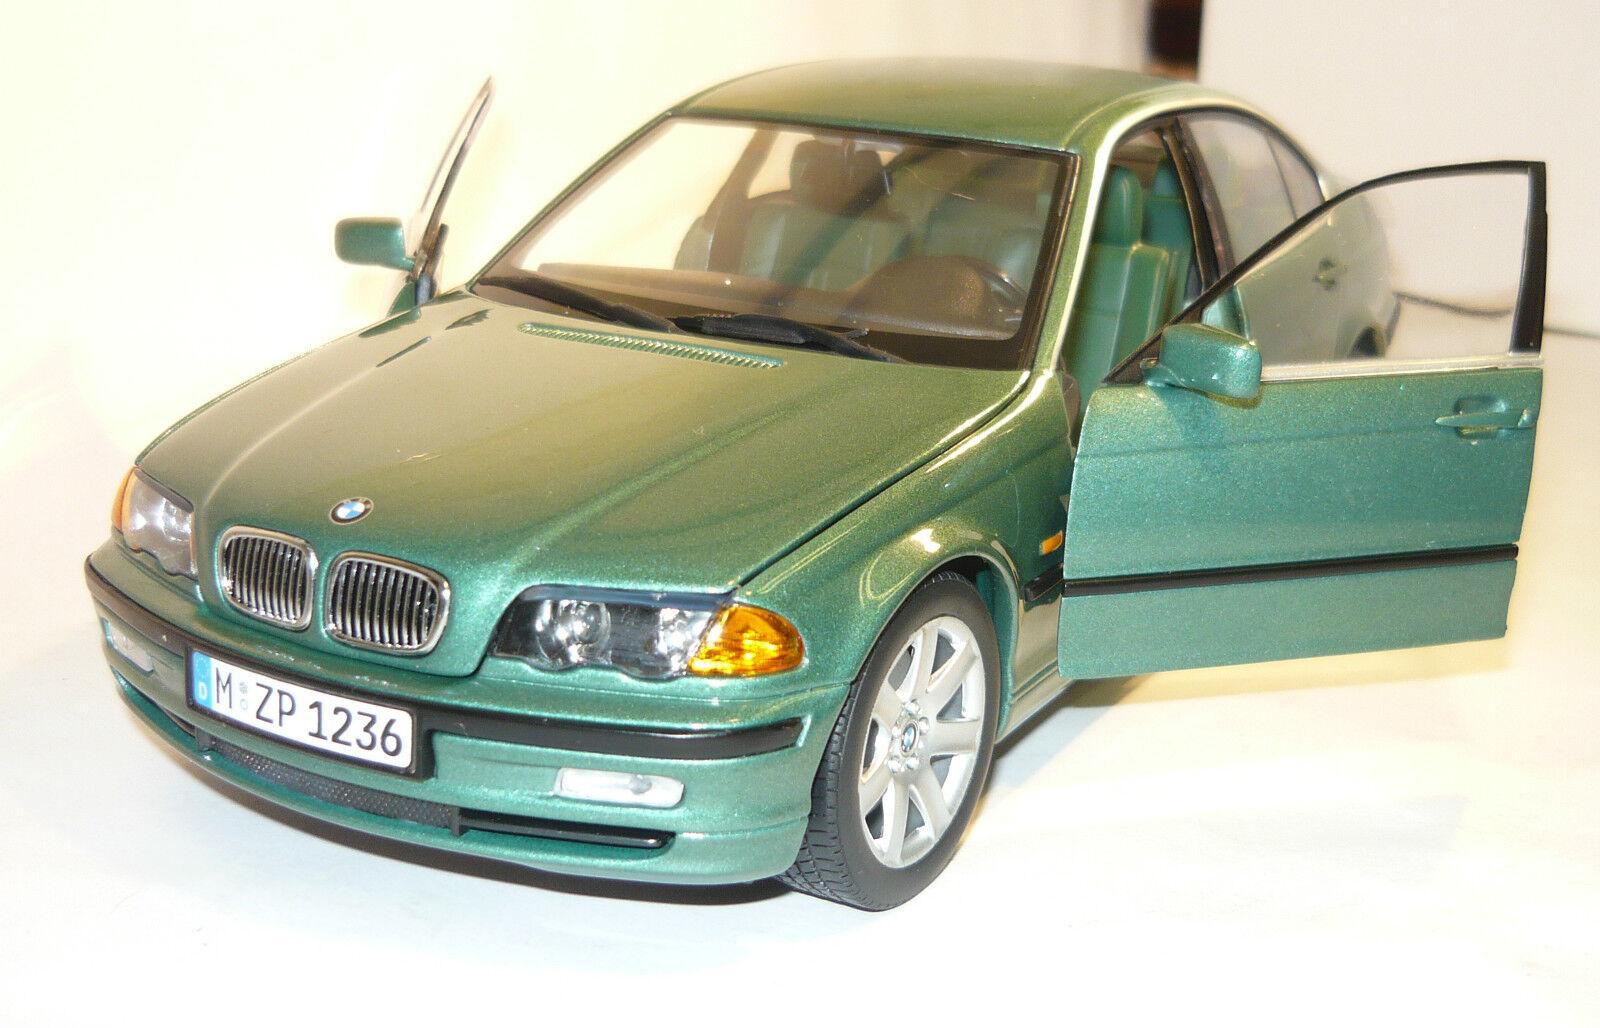 Rivenditori BMW modellololo 80439423173 328i e46 MINT METtuttiIZZATO neu&ovp 118